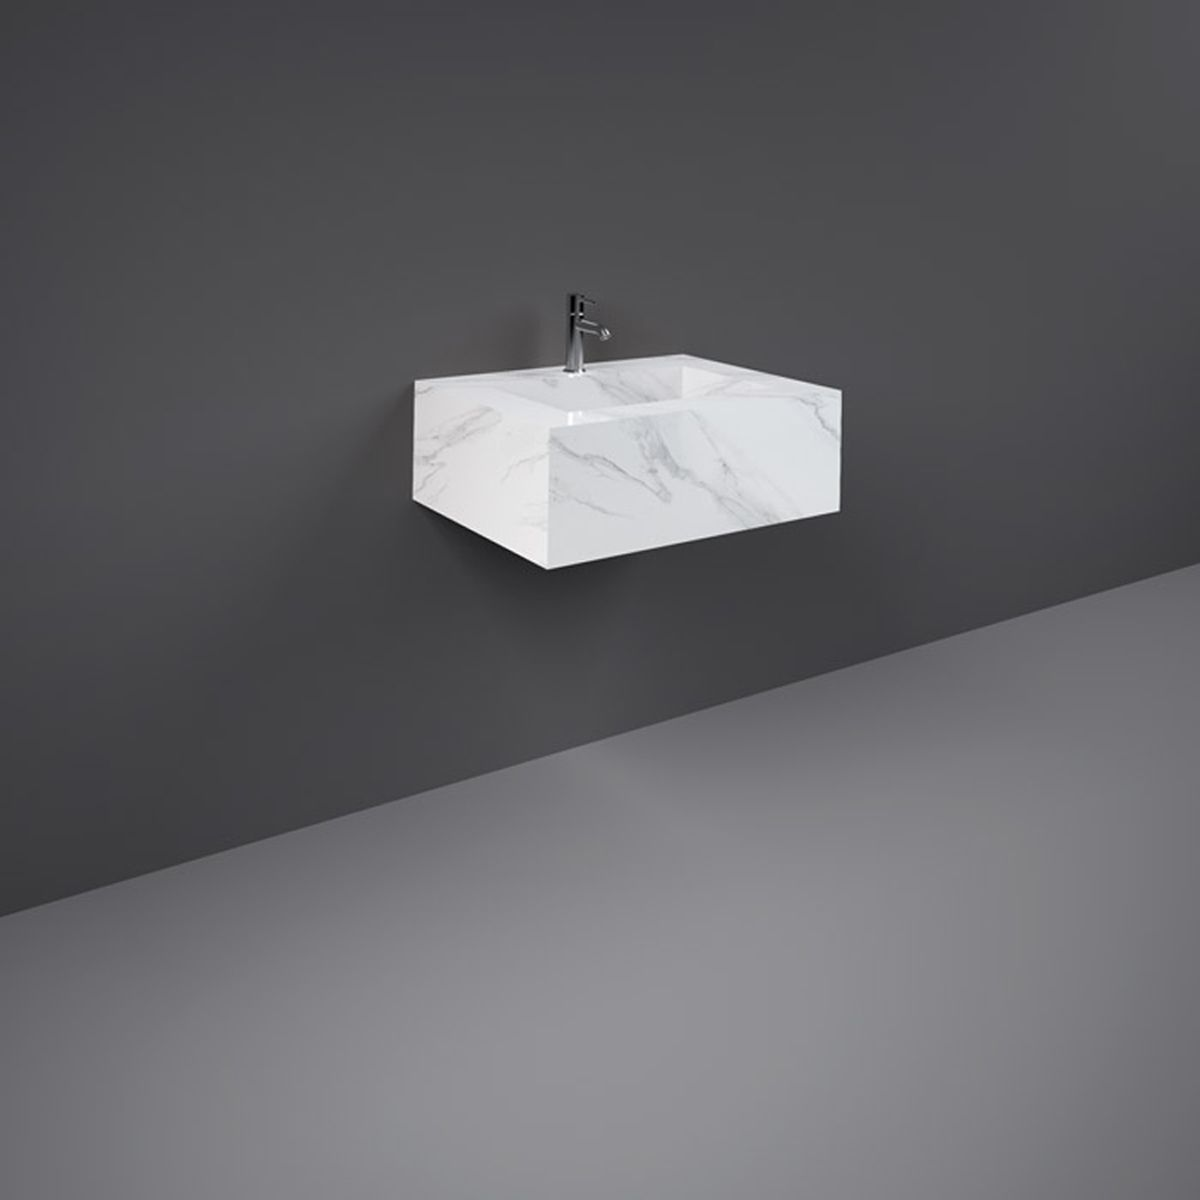 RAK Precious Carrara Wall Hung Counter Basin with Bracket